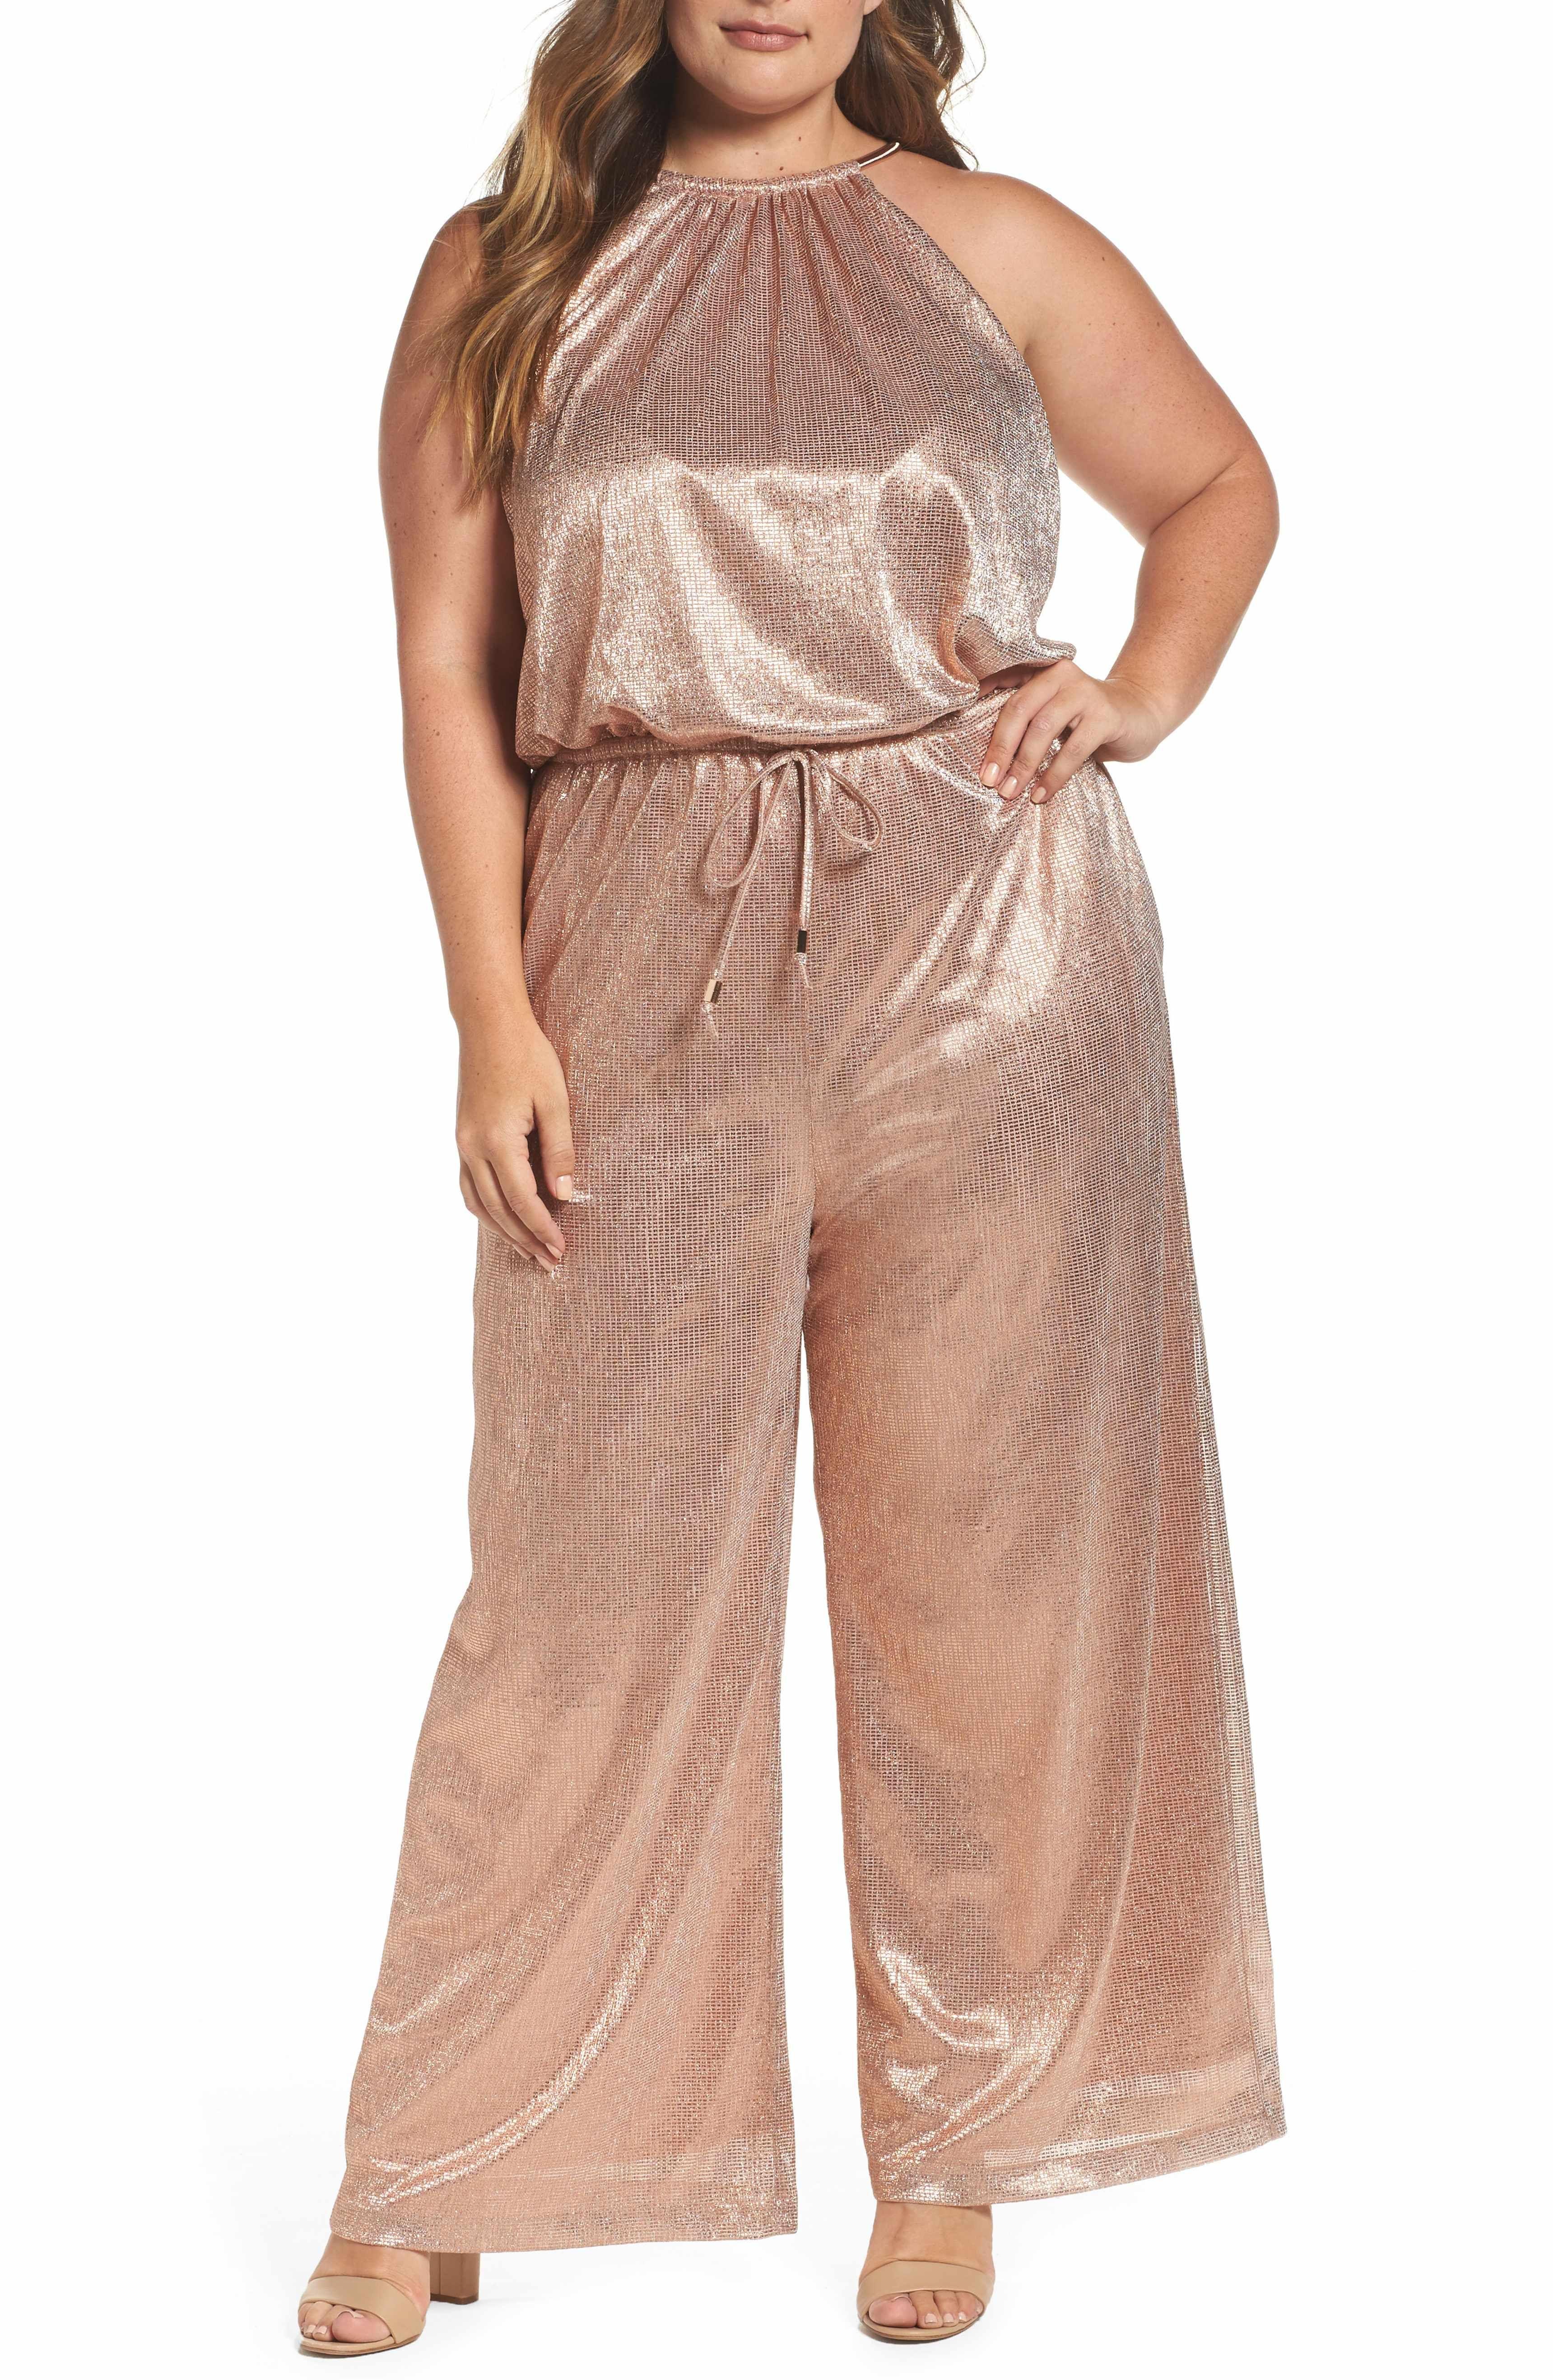 Wedding dresses under $200  Main Image  Vince Camuto Metallic Halter Jumpsuit Plus Size